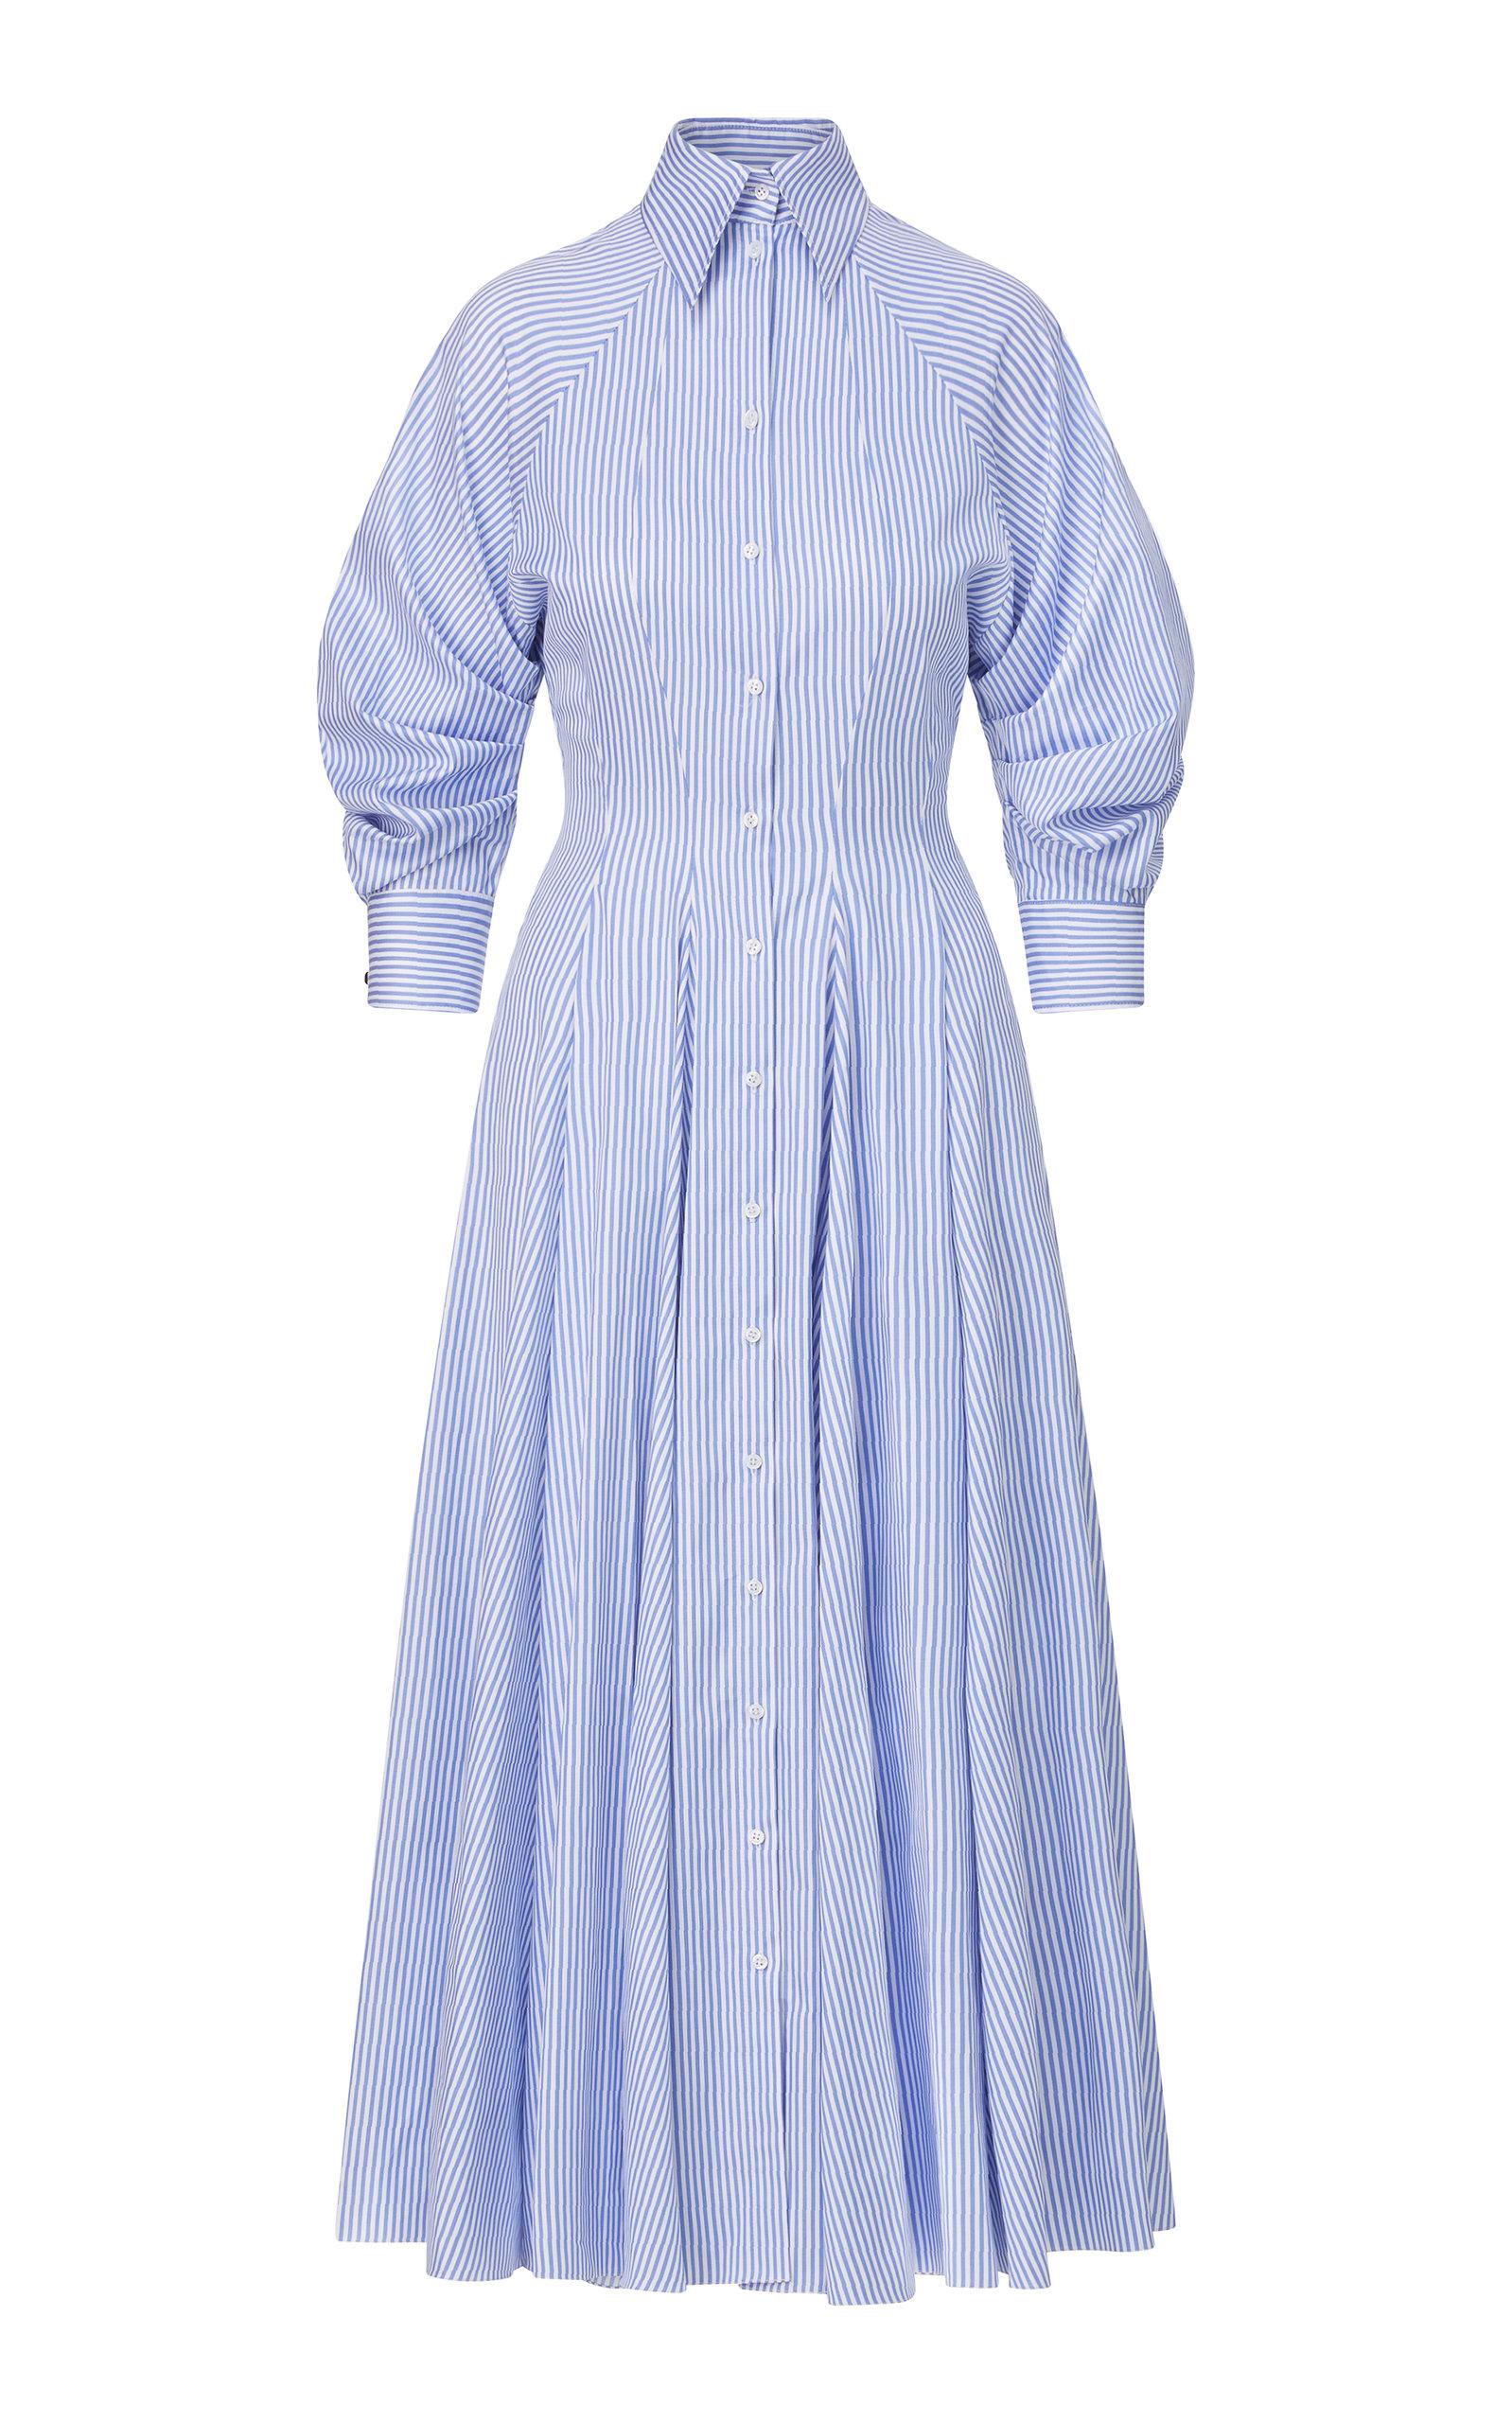 Women's Striped Cotton Maxi Shirt Dress